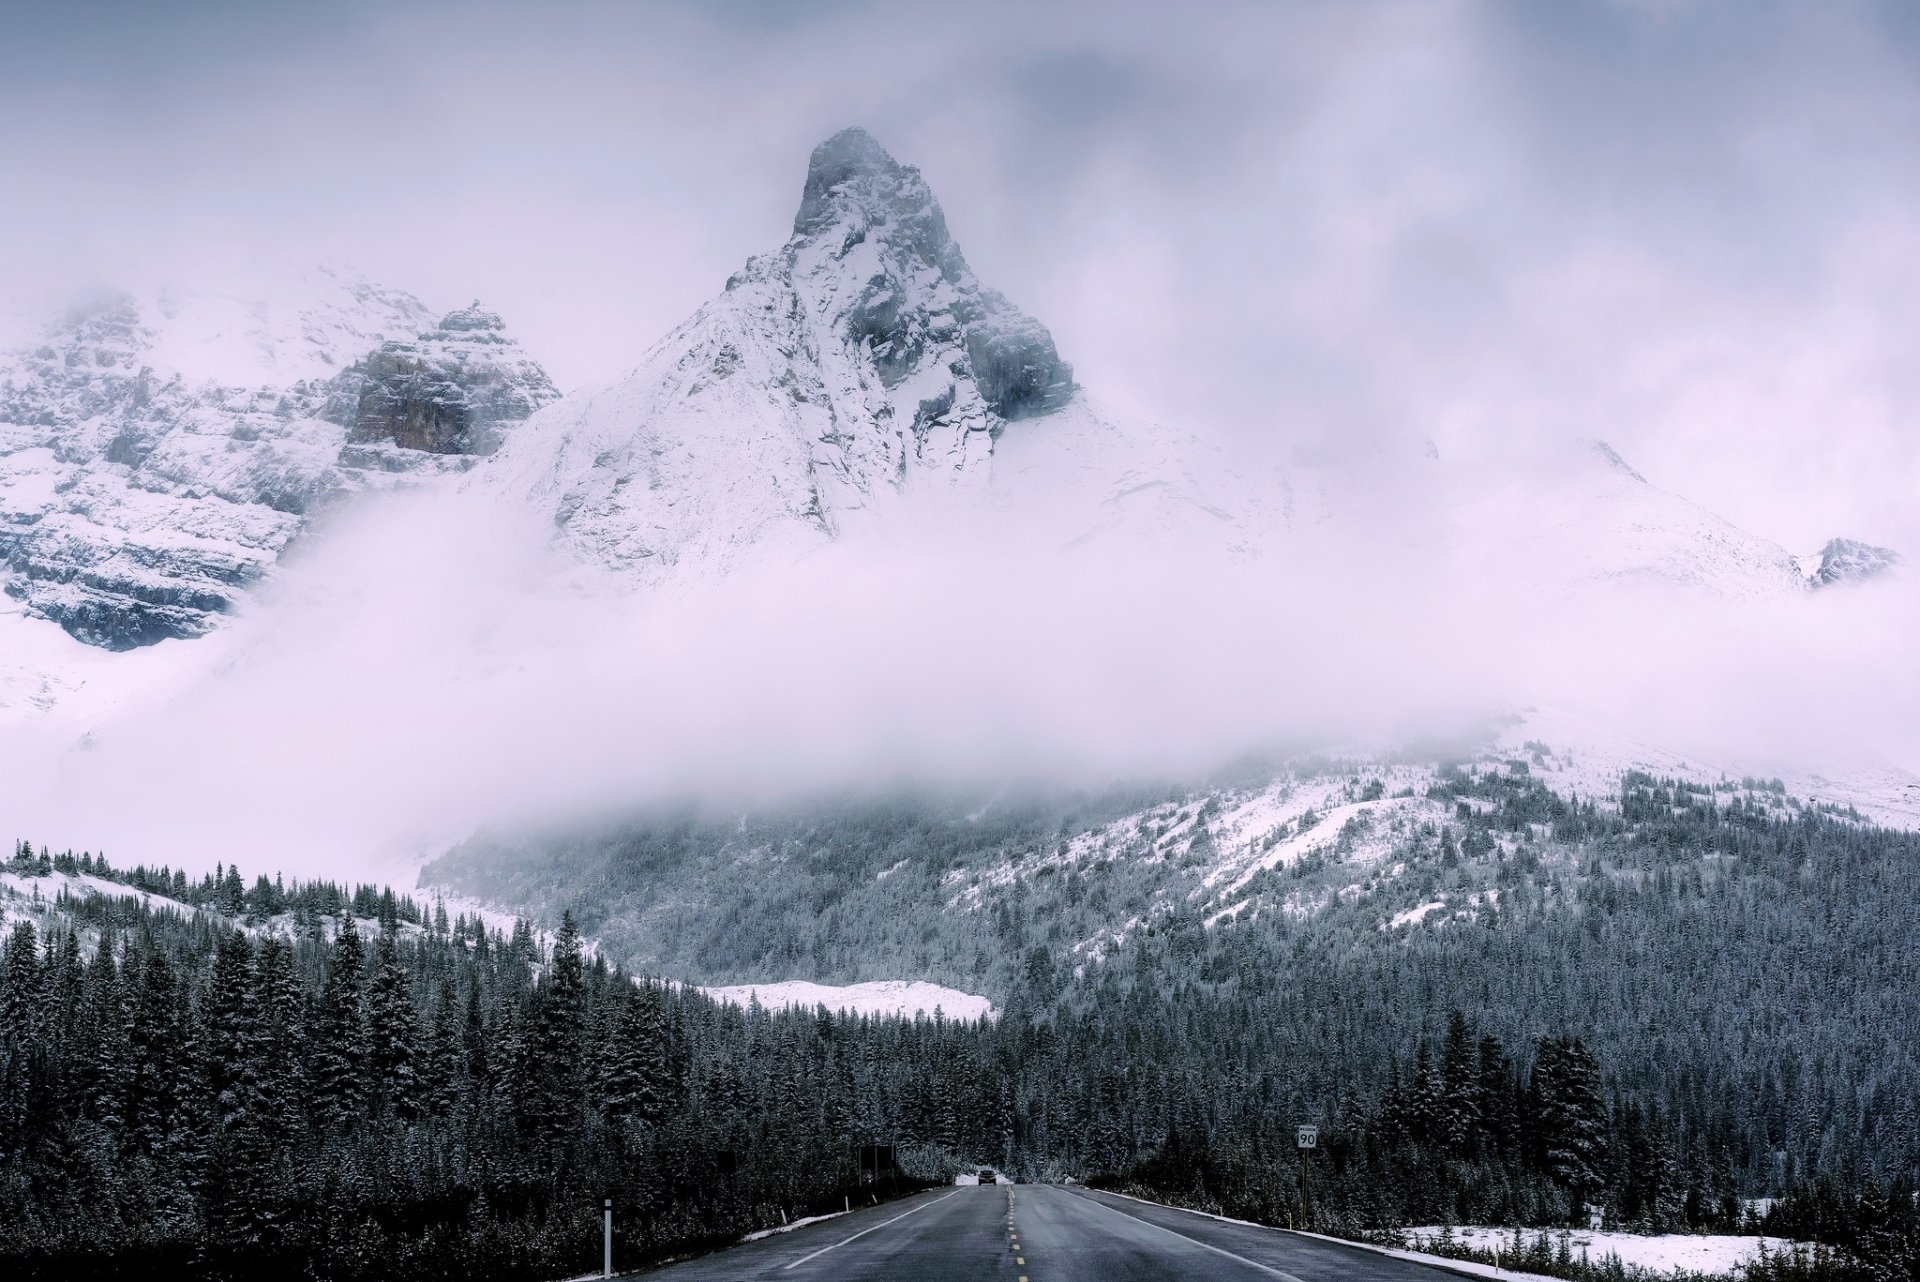 Man Made - Road  Fog Nature Forest Winter Snow Peak Mountain Wallpaper